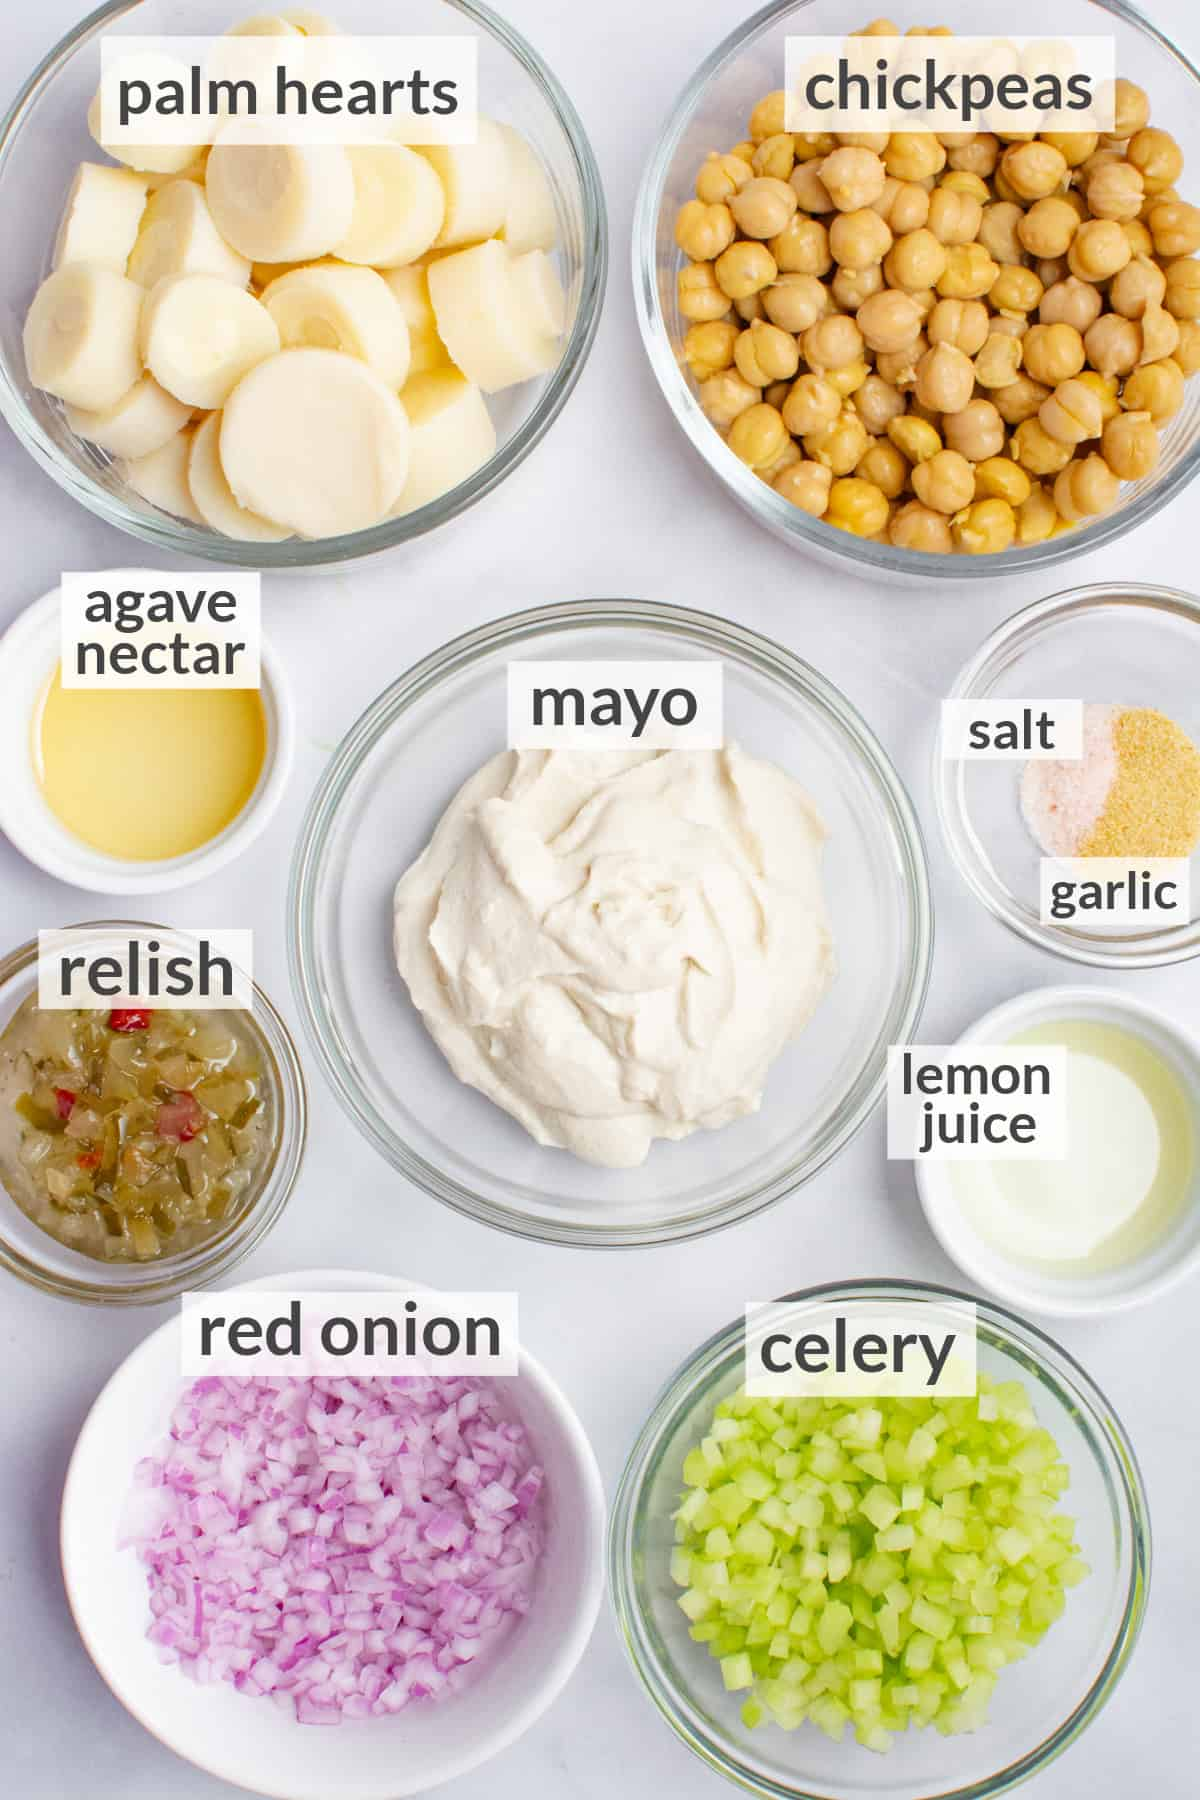 Ingredients for vegan tuna salad.